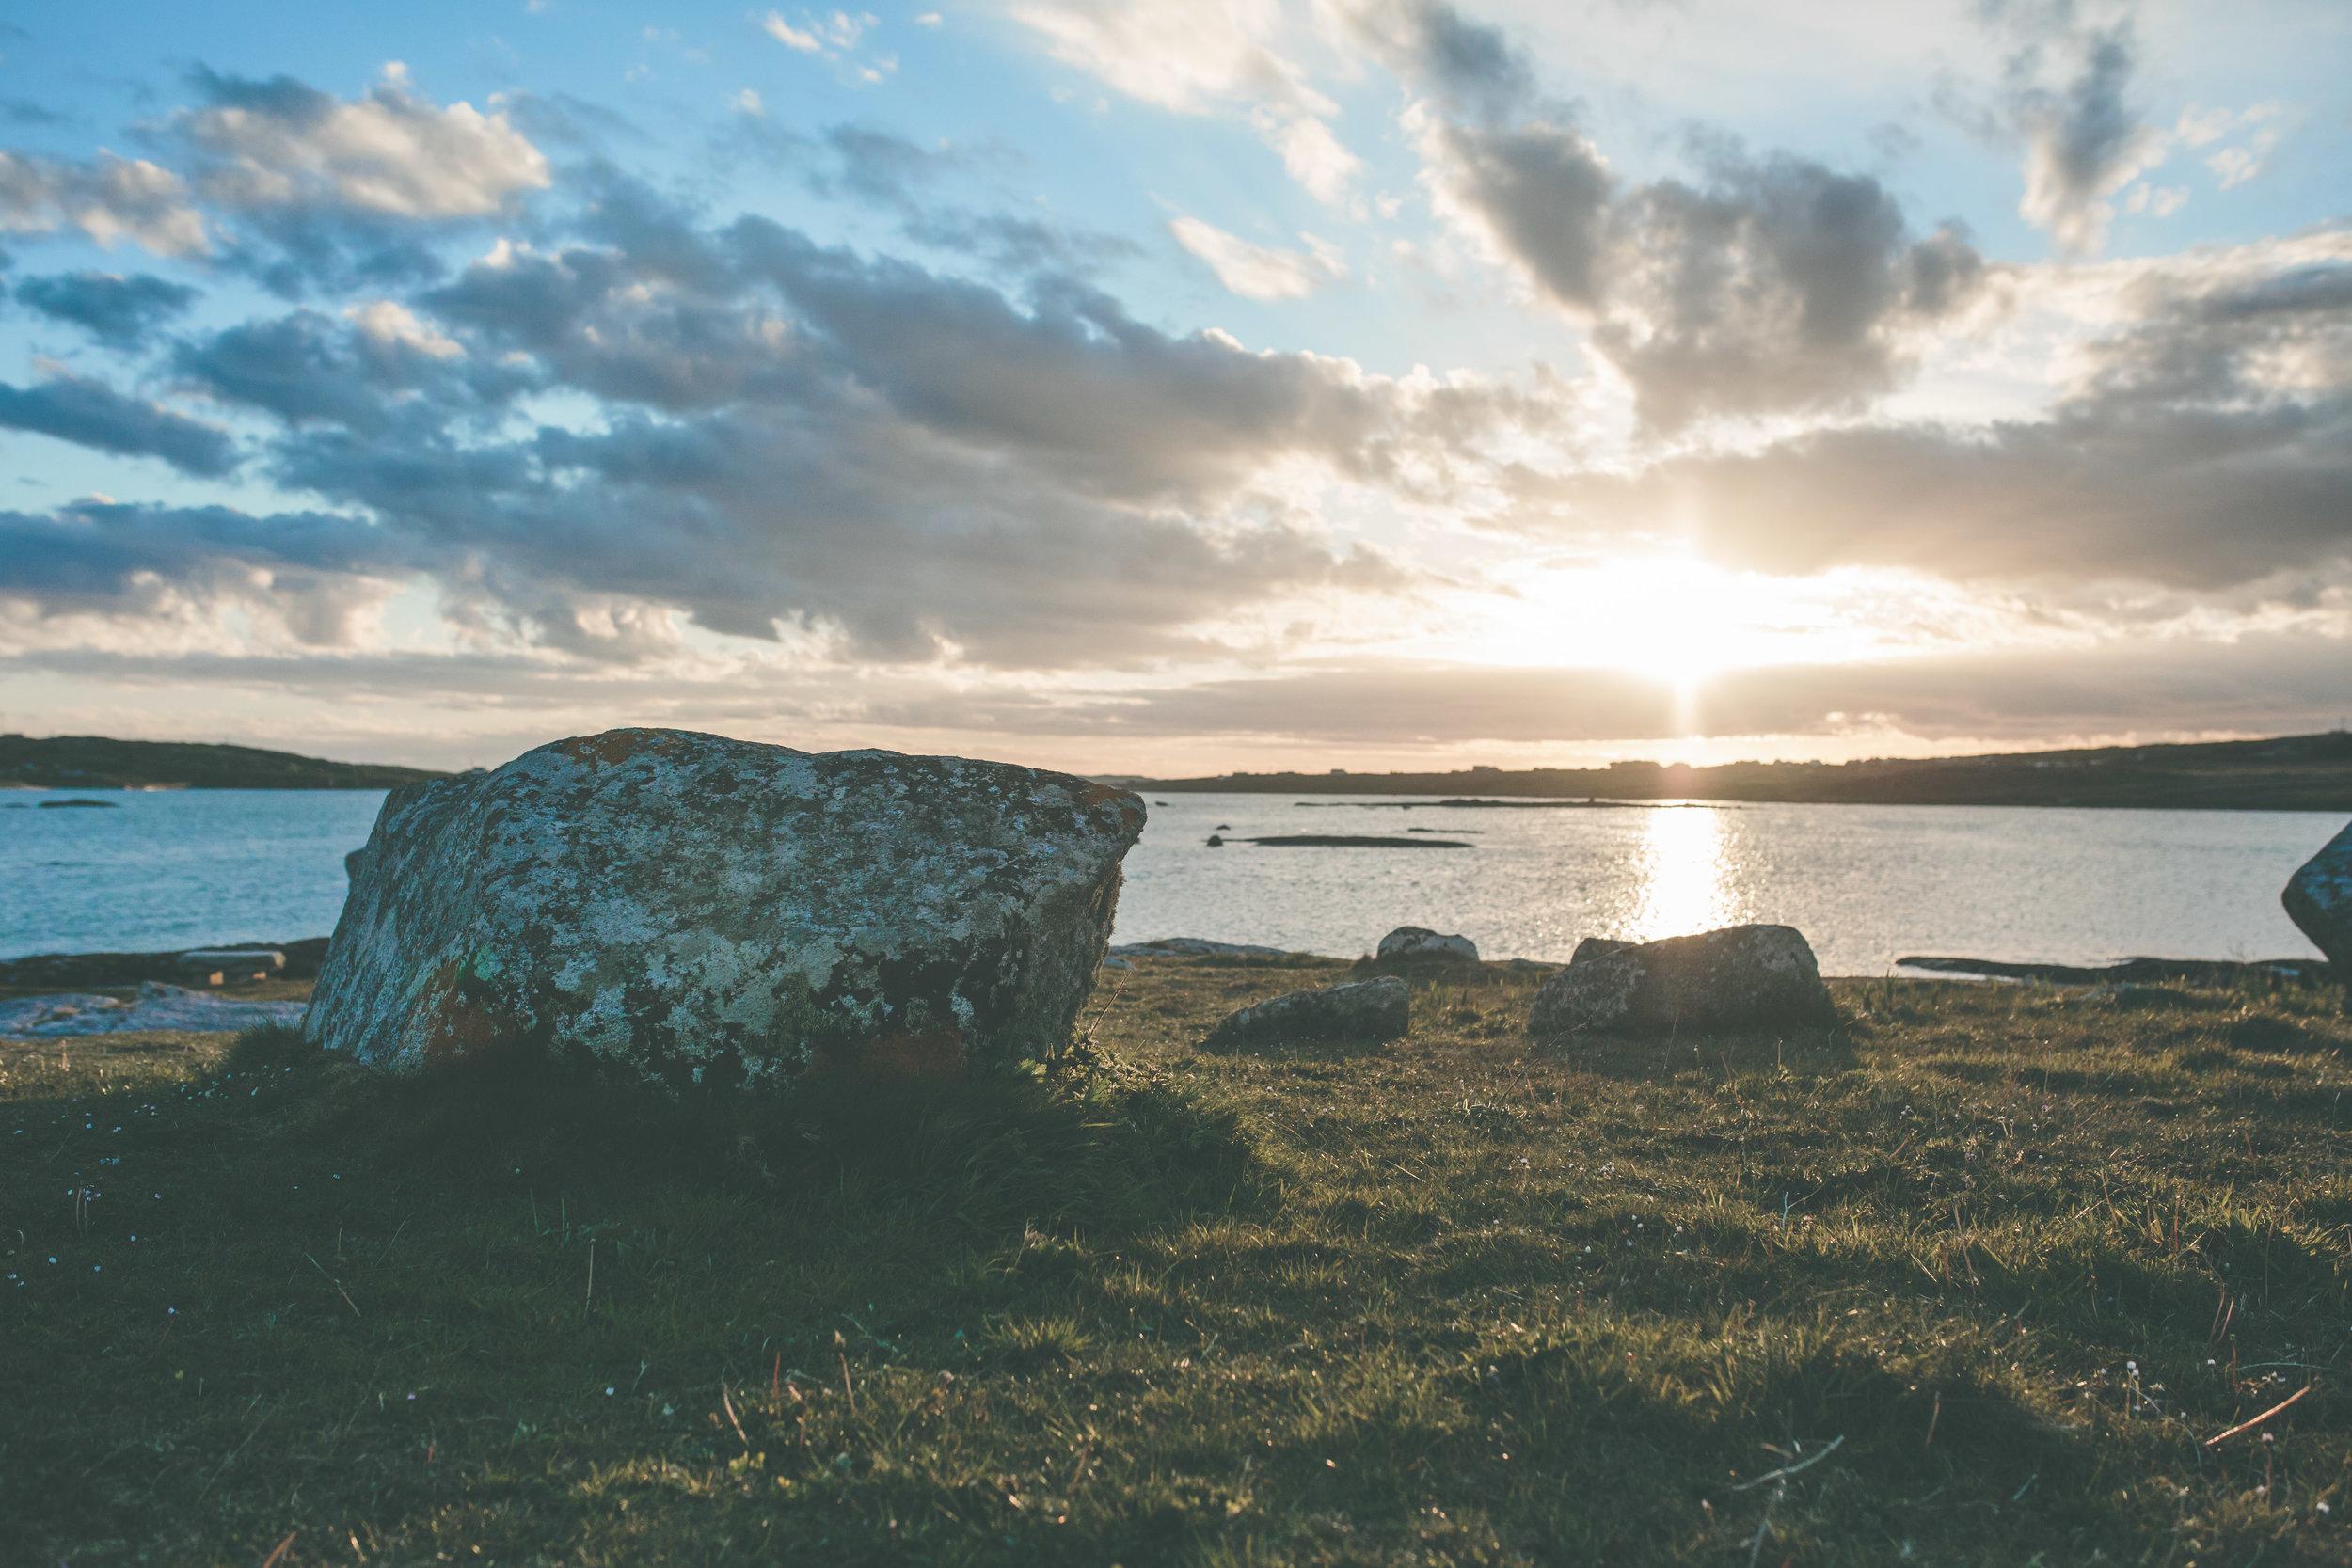 Ireland wedding photographer - Olivia Moon Photography